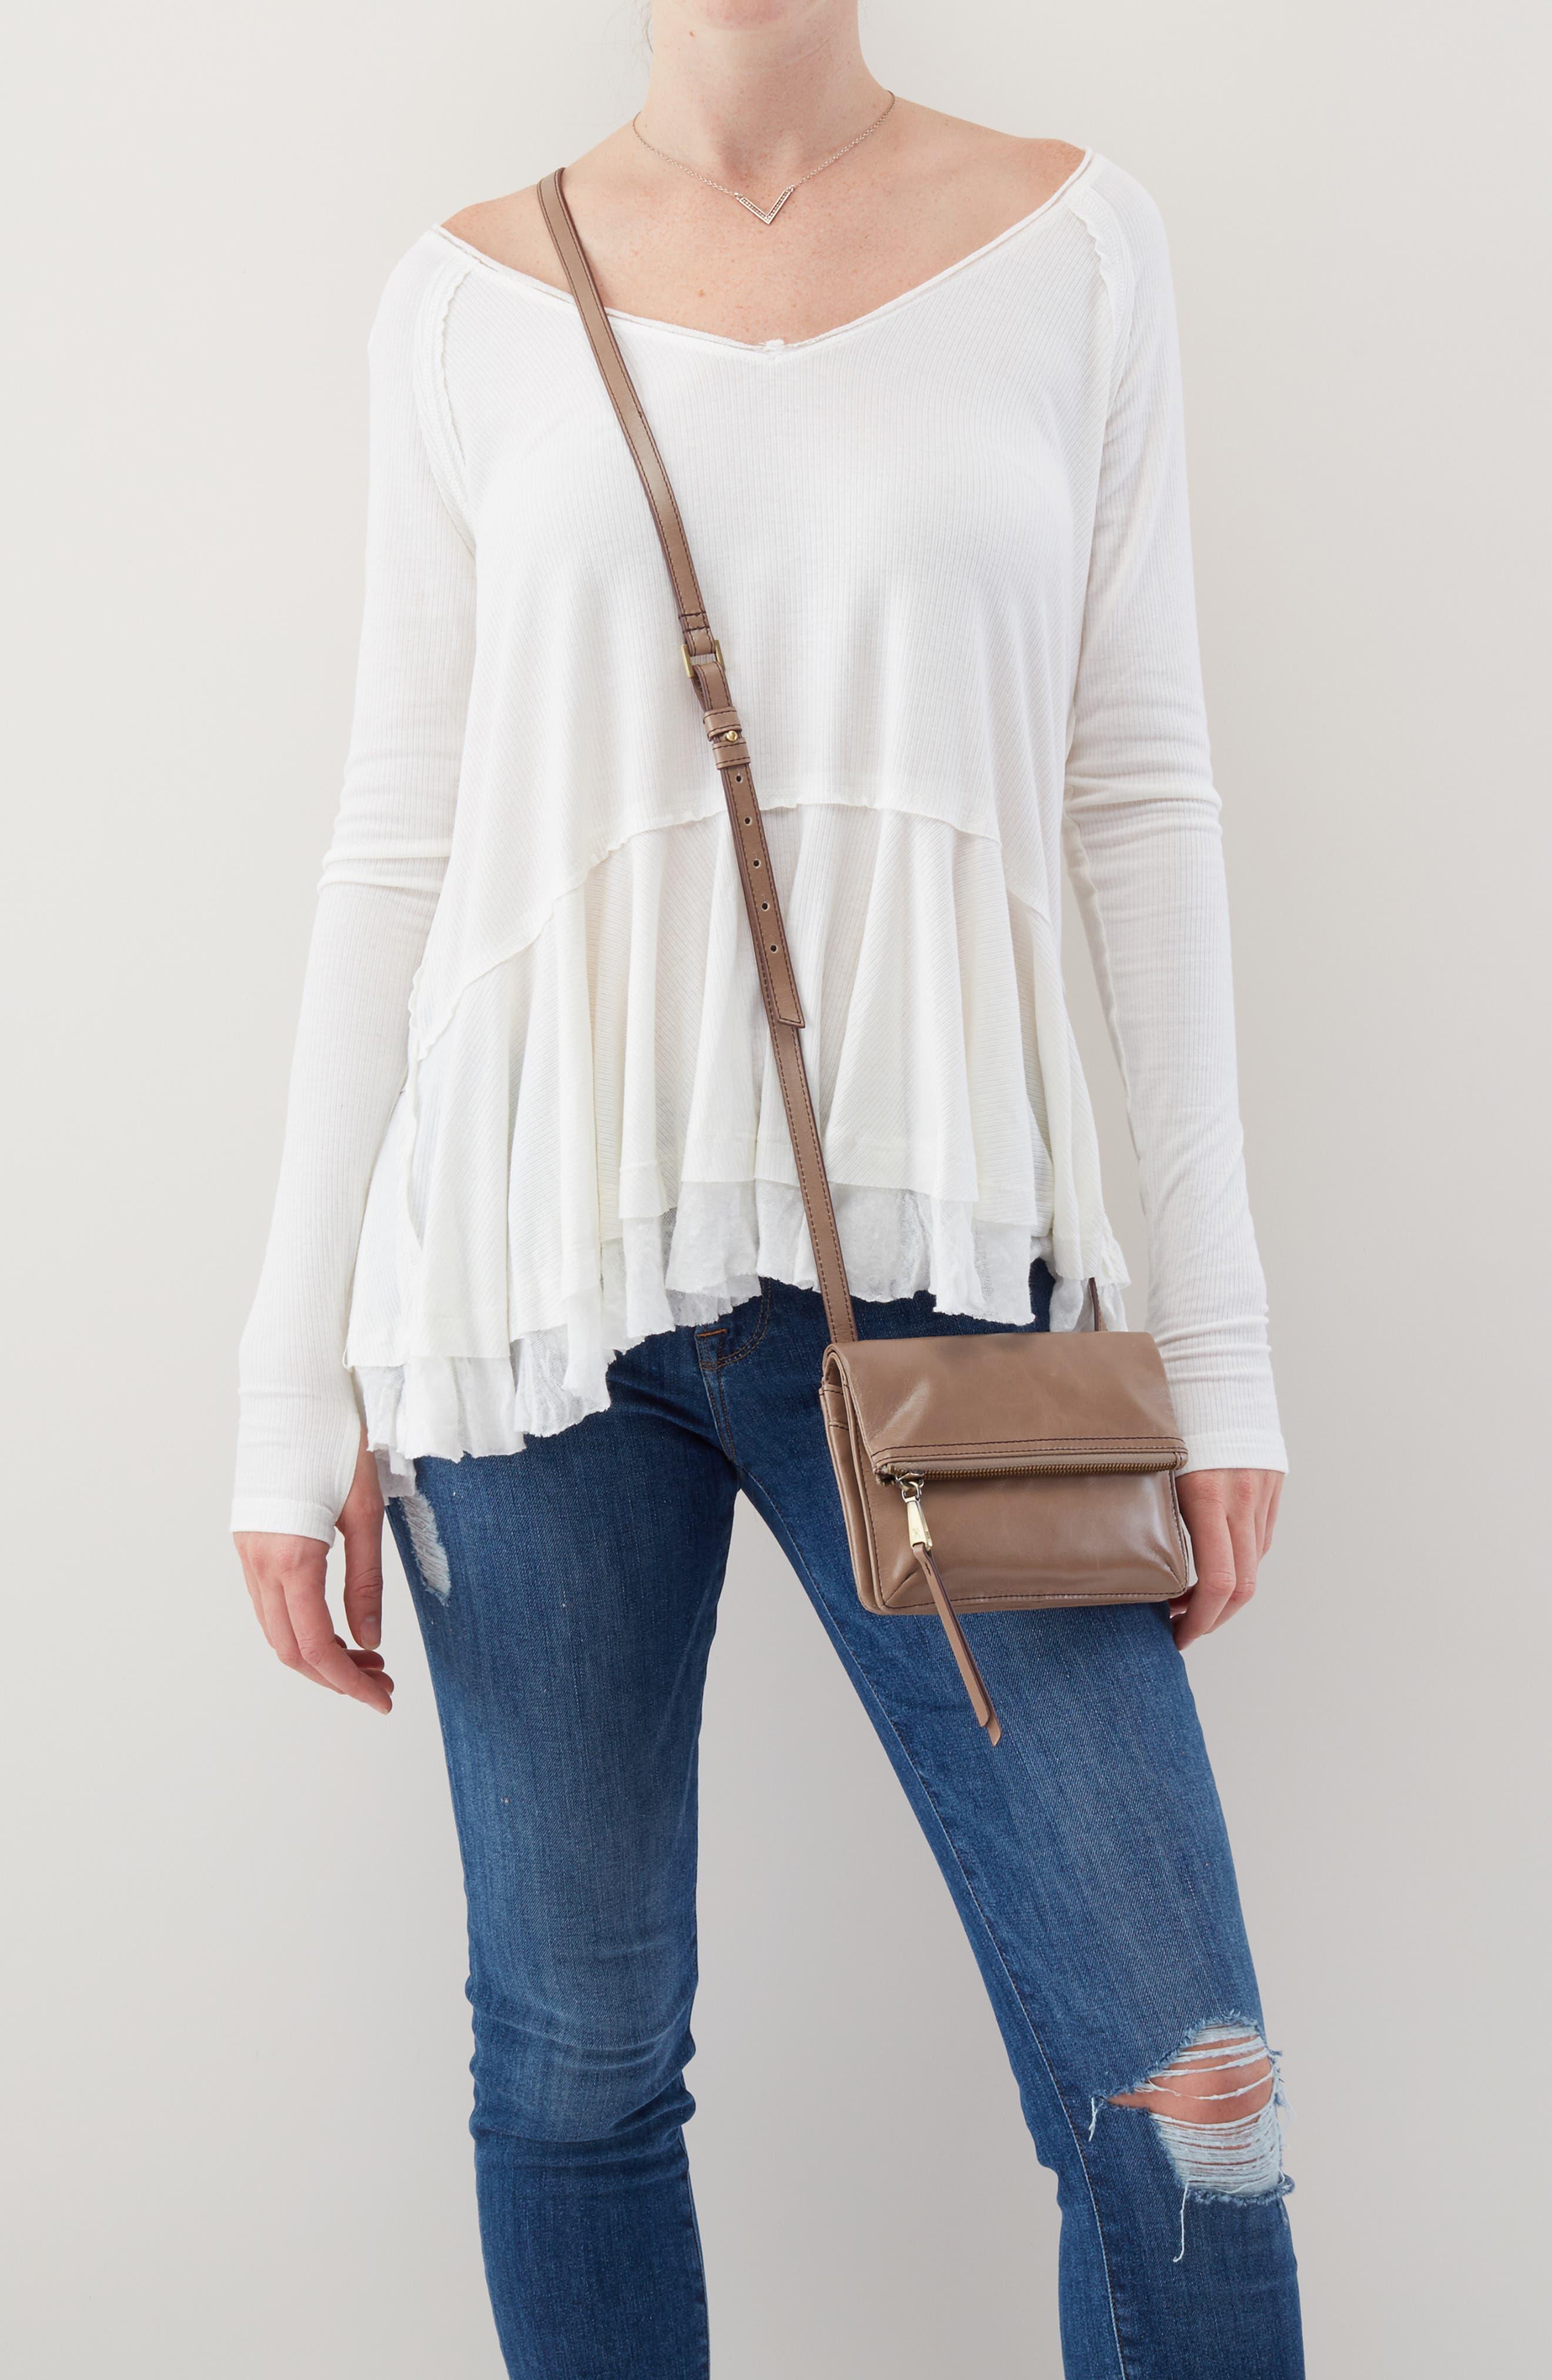 Glade Leather Crossbody Bag,                             Alternate thumbnail 2, color,                             COBBLESTONE